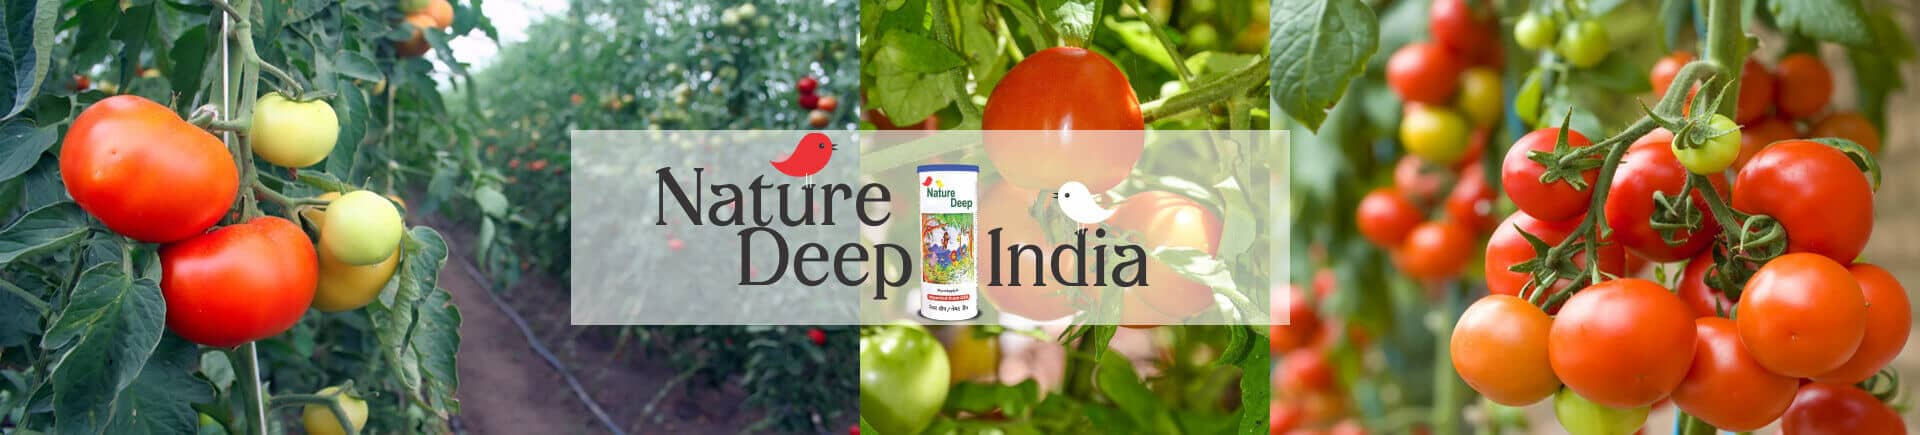 sumitomo naturedeep for tomato crop desktop banner